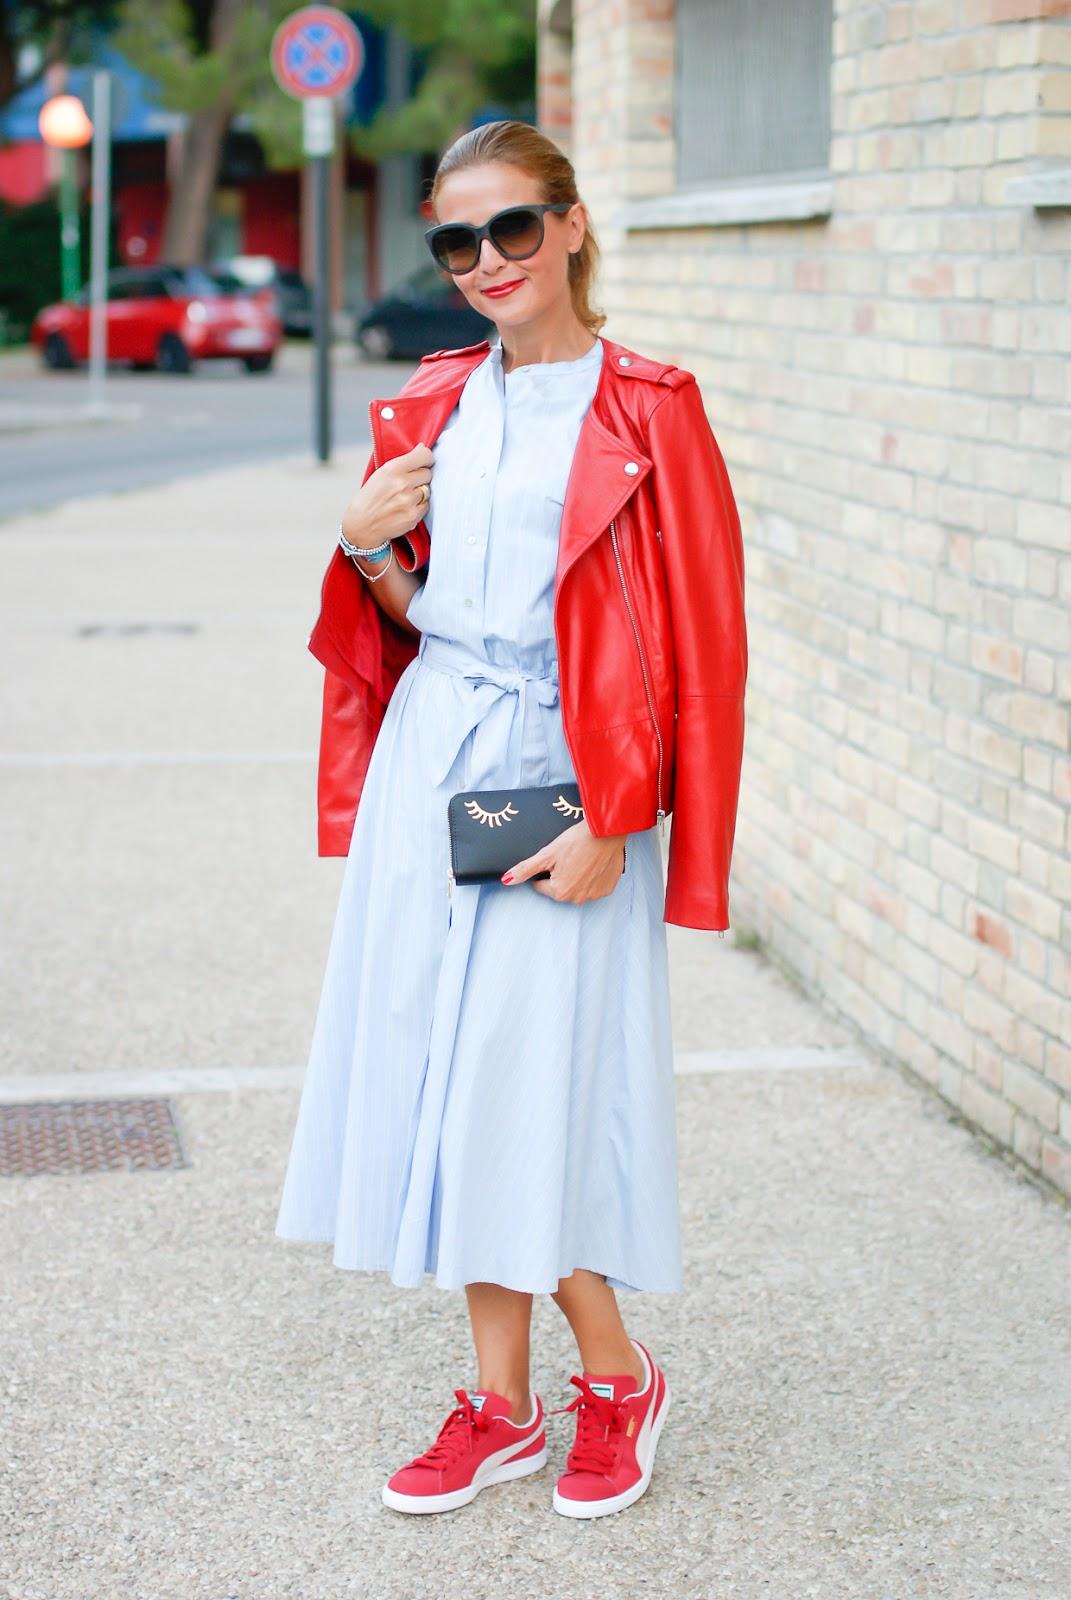 Biker jacket and dress on Fashion and Cookies fashion blog, fashion blogger style